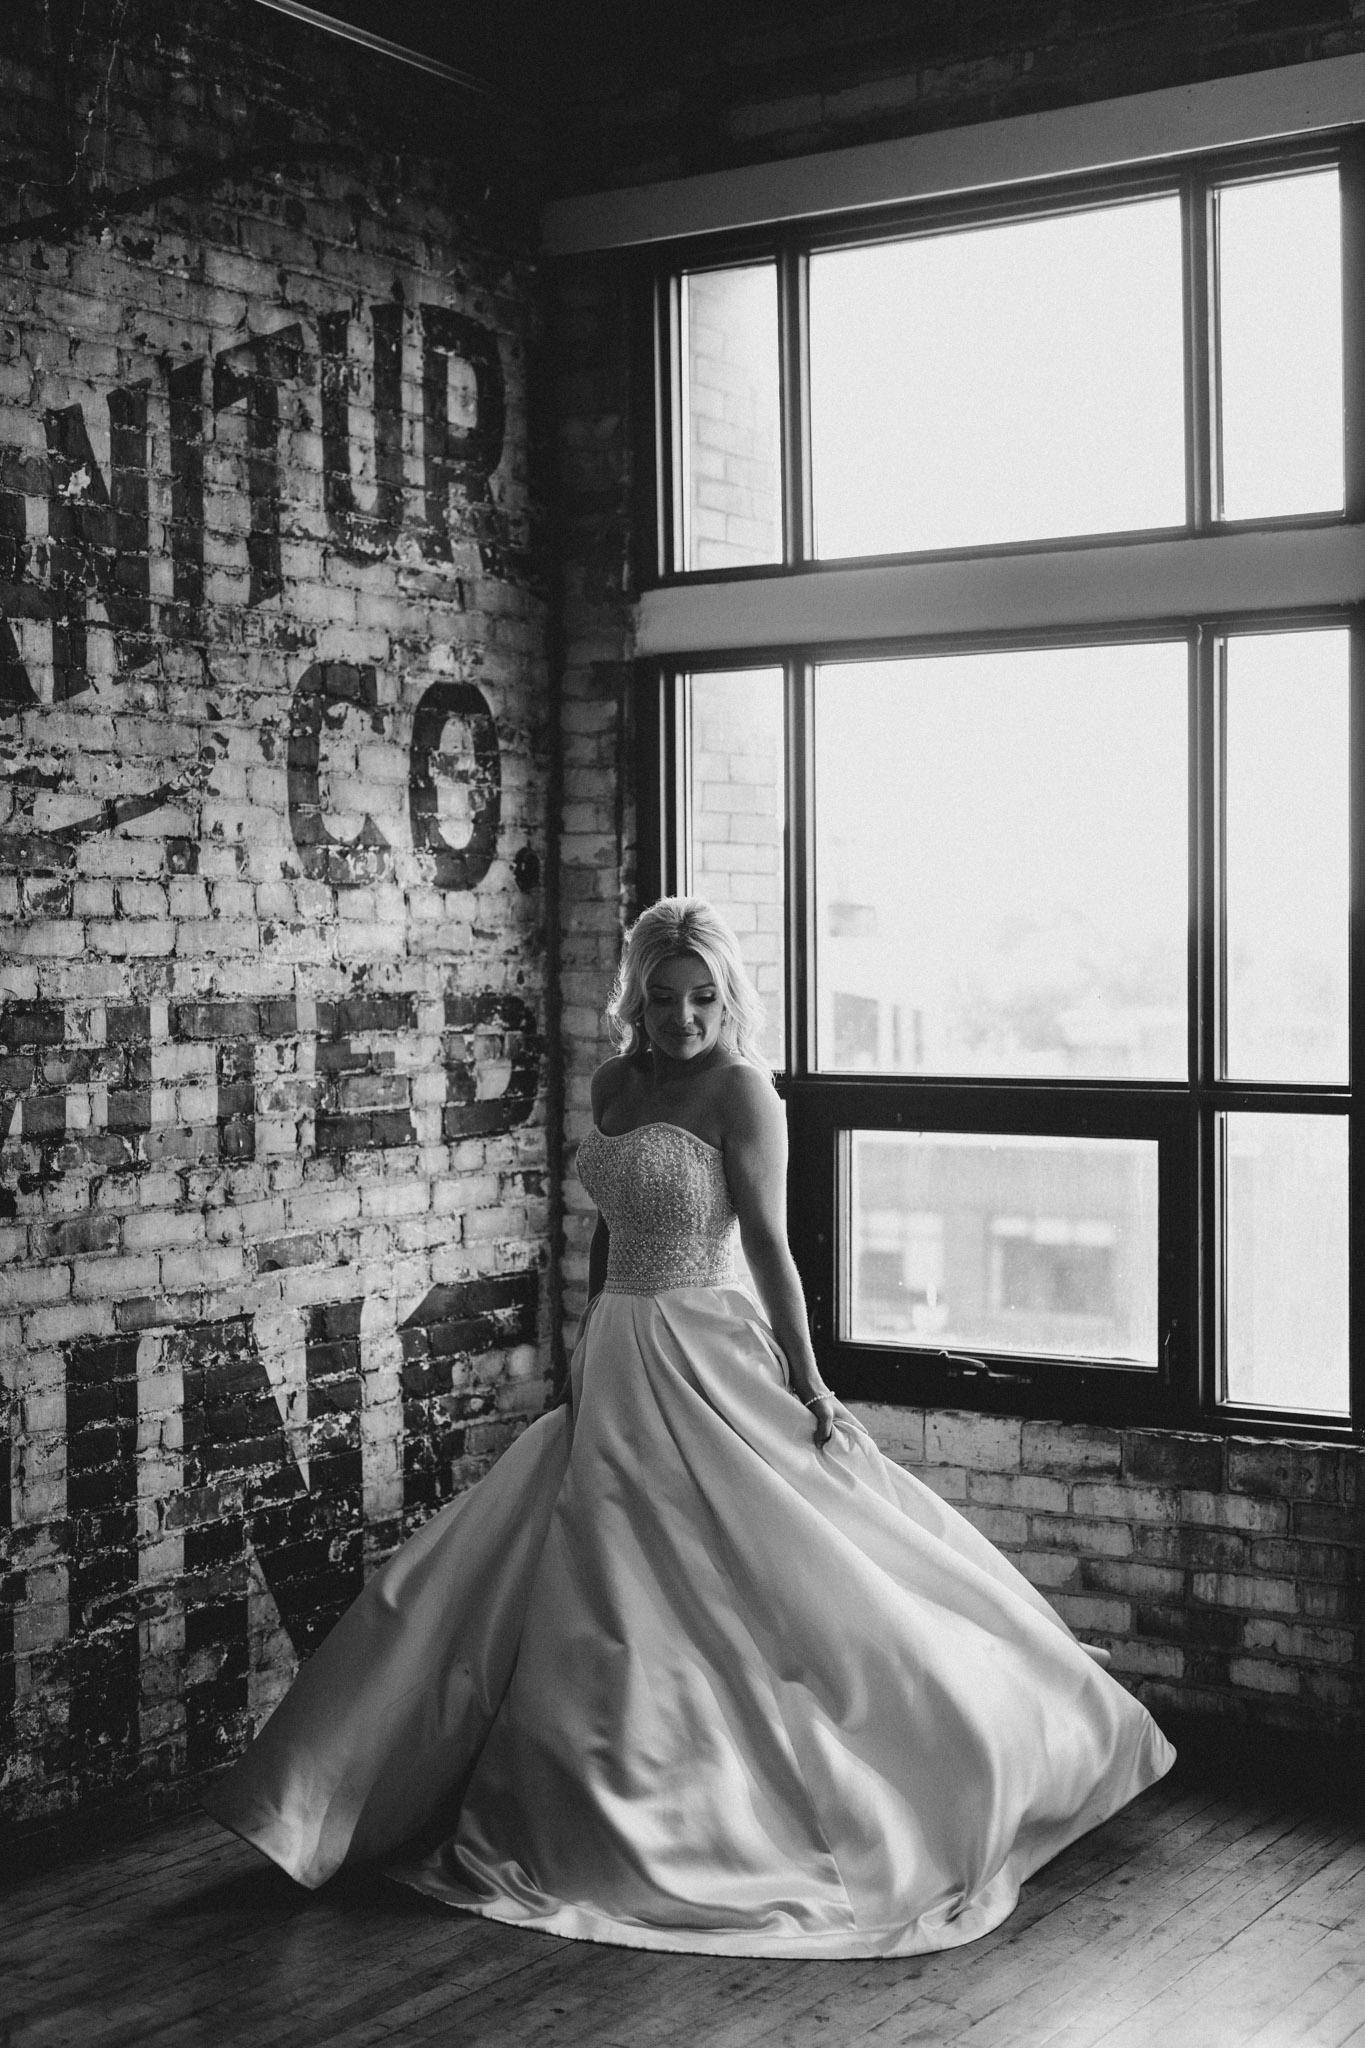 Swishing the dress at The Burroughes Wedding. Love By Lynzie. Wedding Photographer Jennifer See Studios.